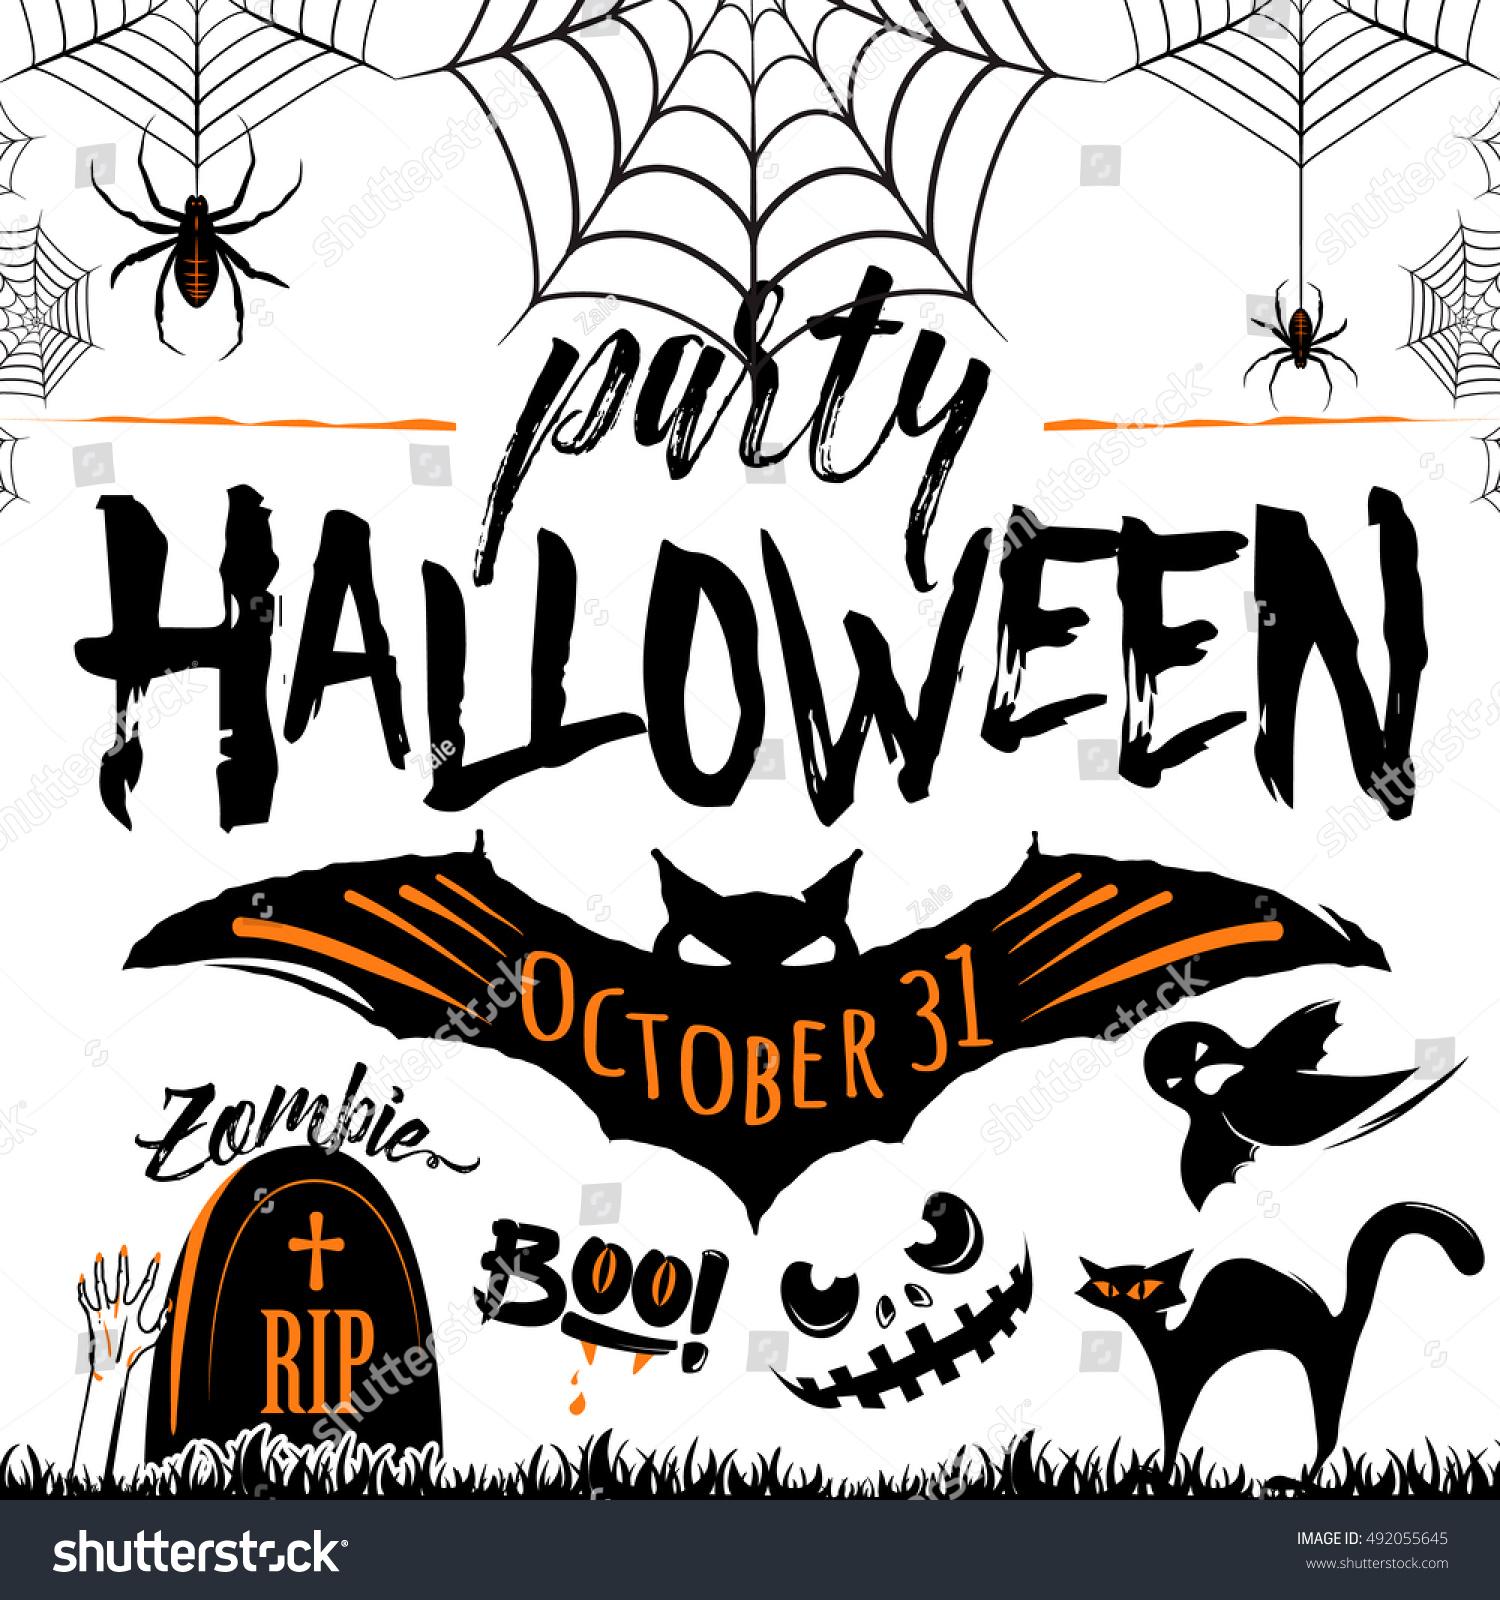 zombie halloween invitations vector illustration halloween celebration poster halloween stock - Zombie Halloween Invitations